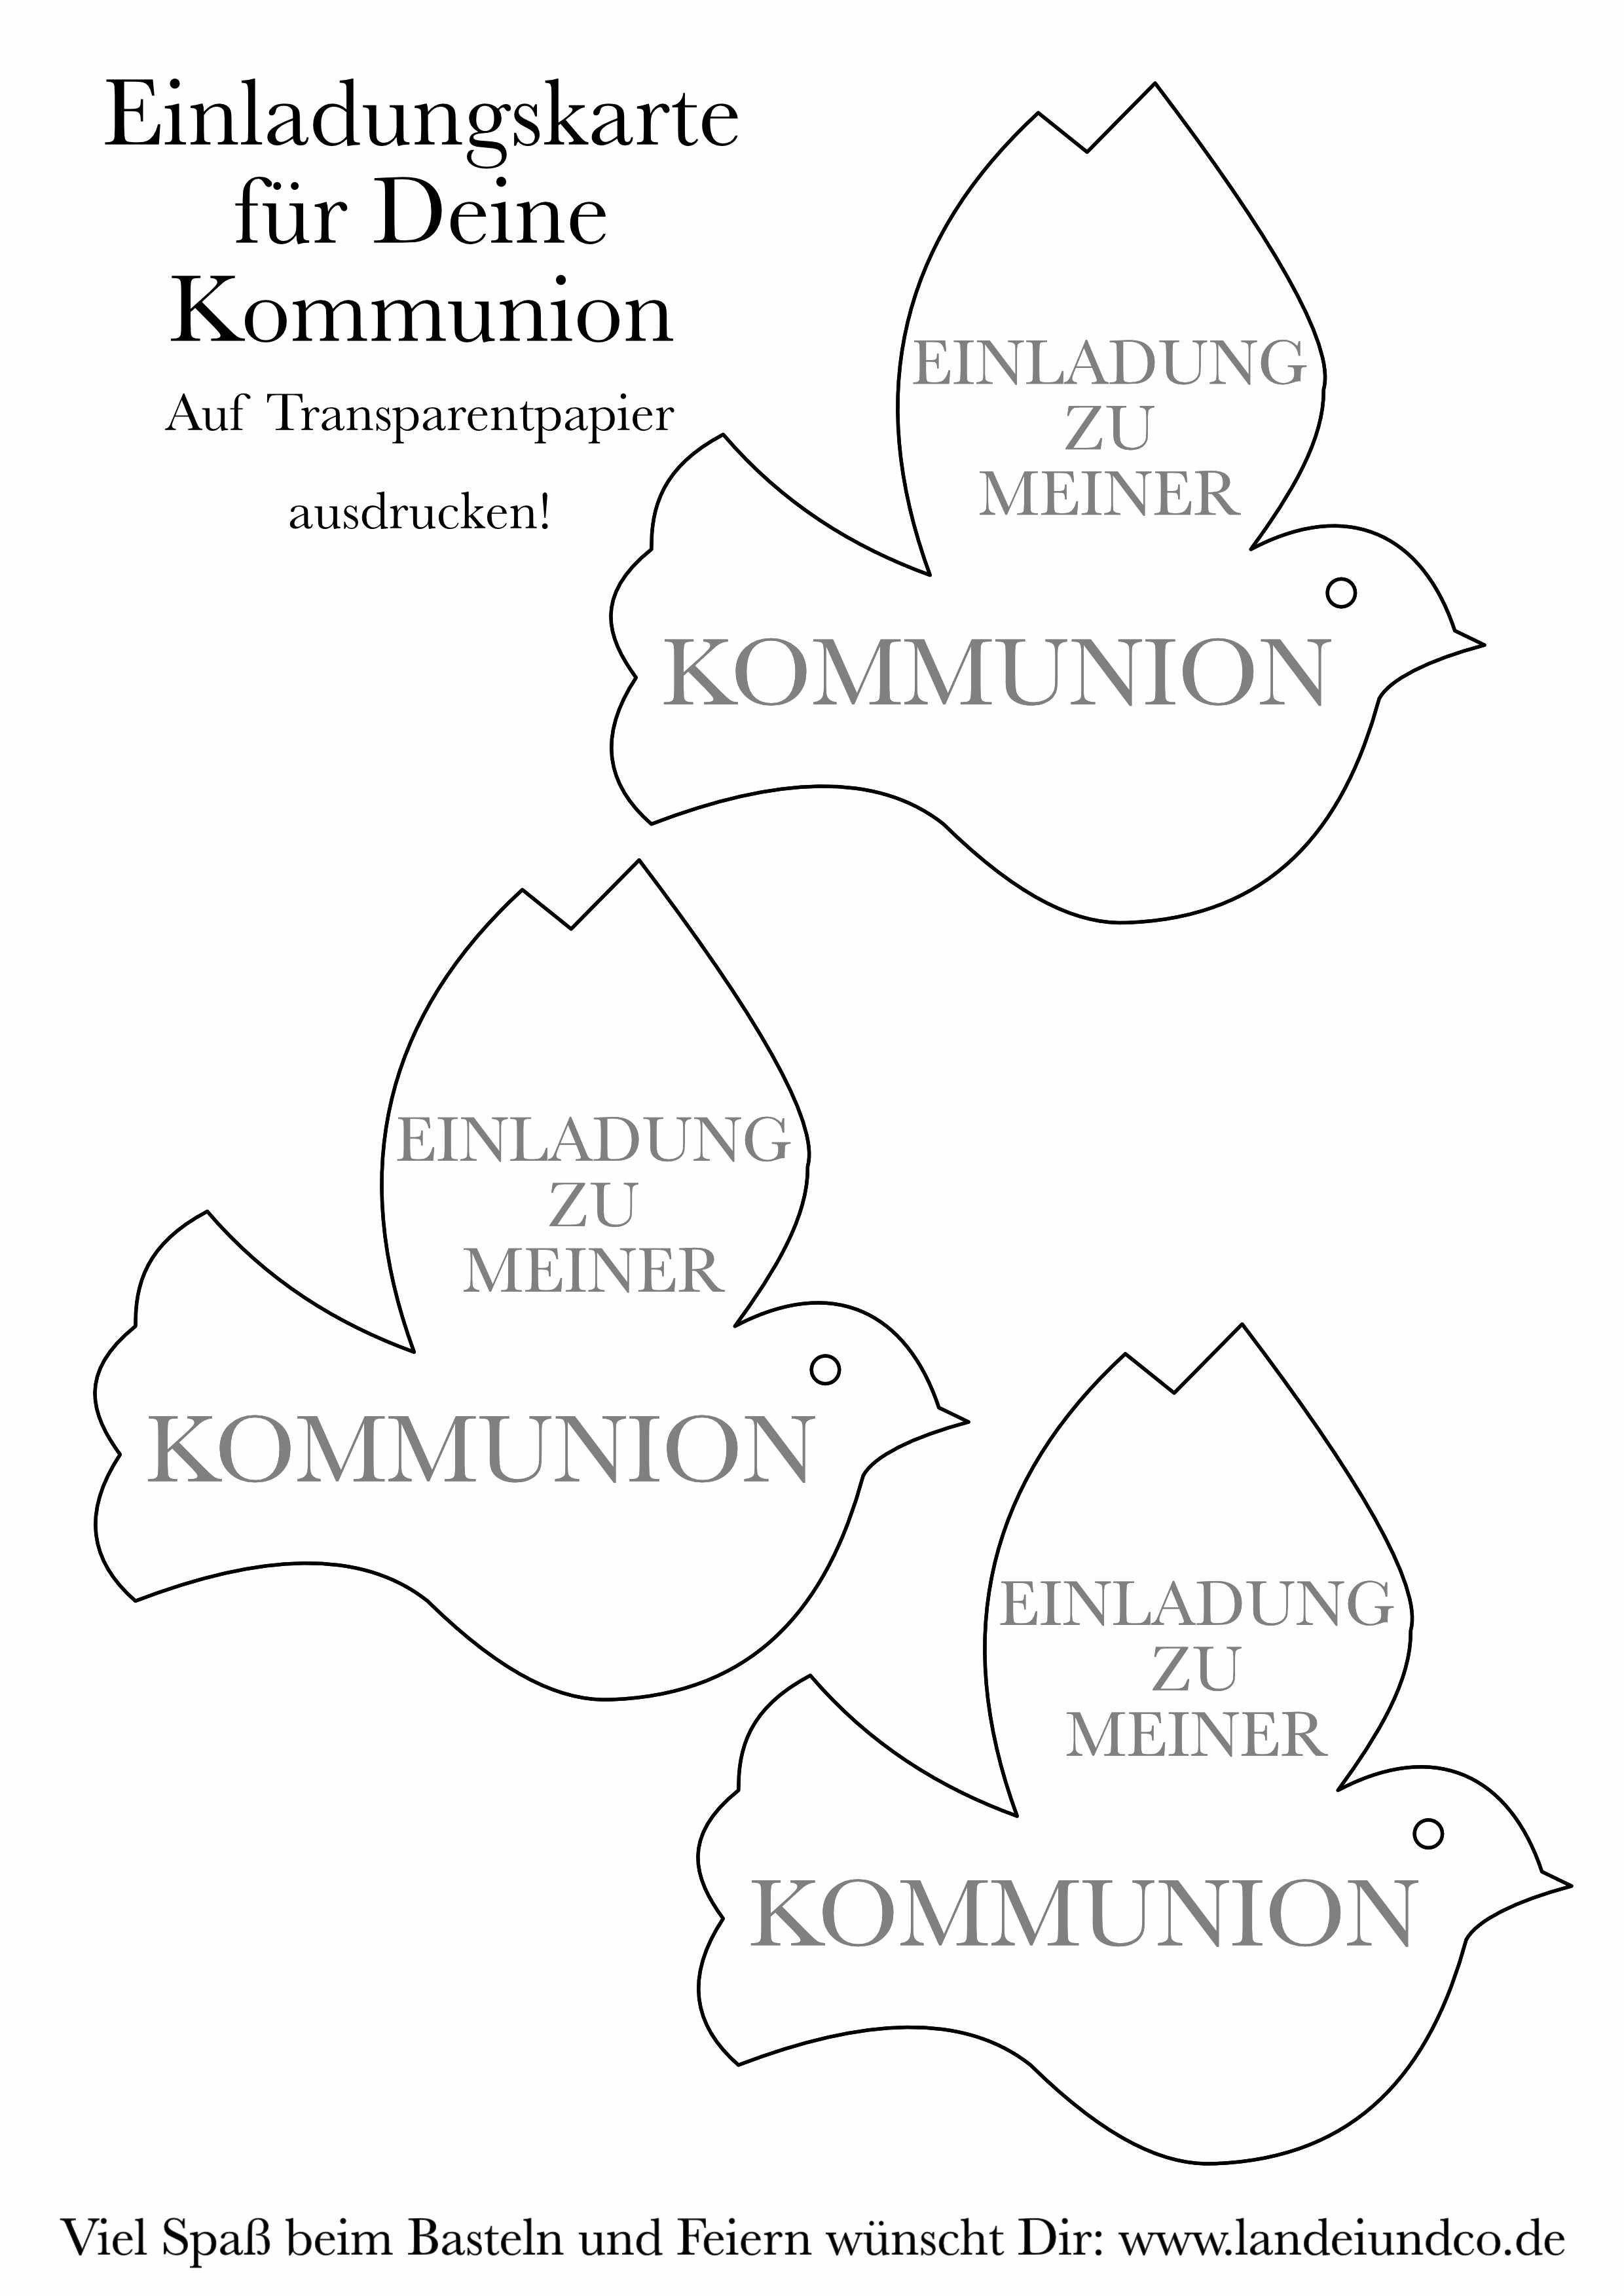 Free Printable Taube Mit Text Kommunion! Klick!